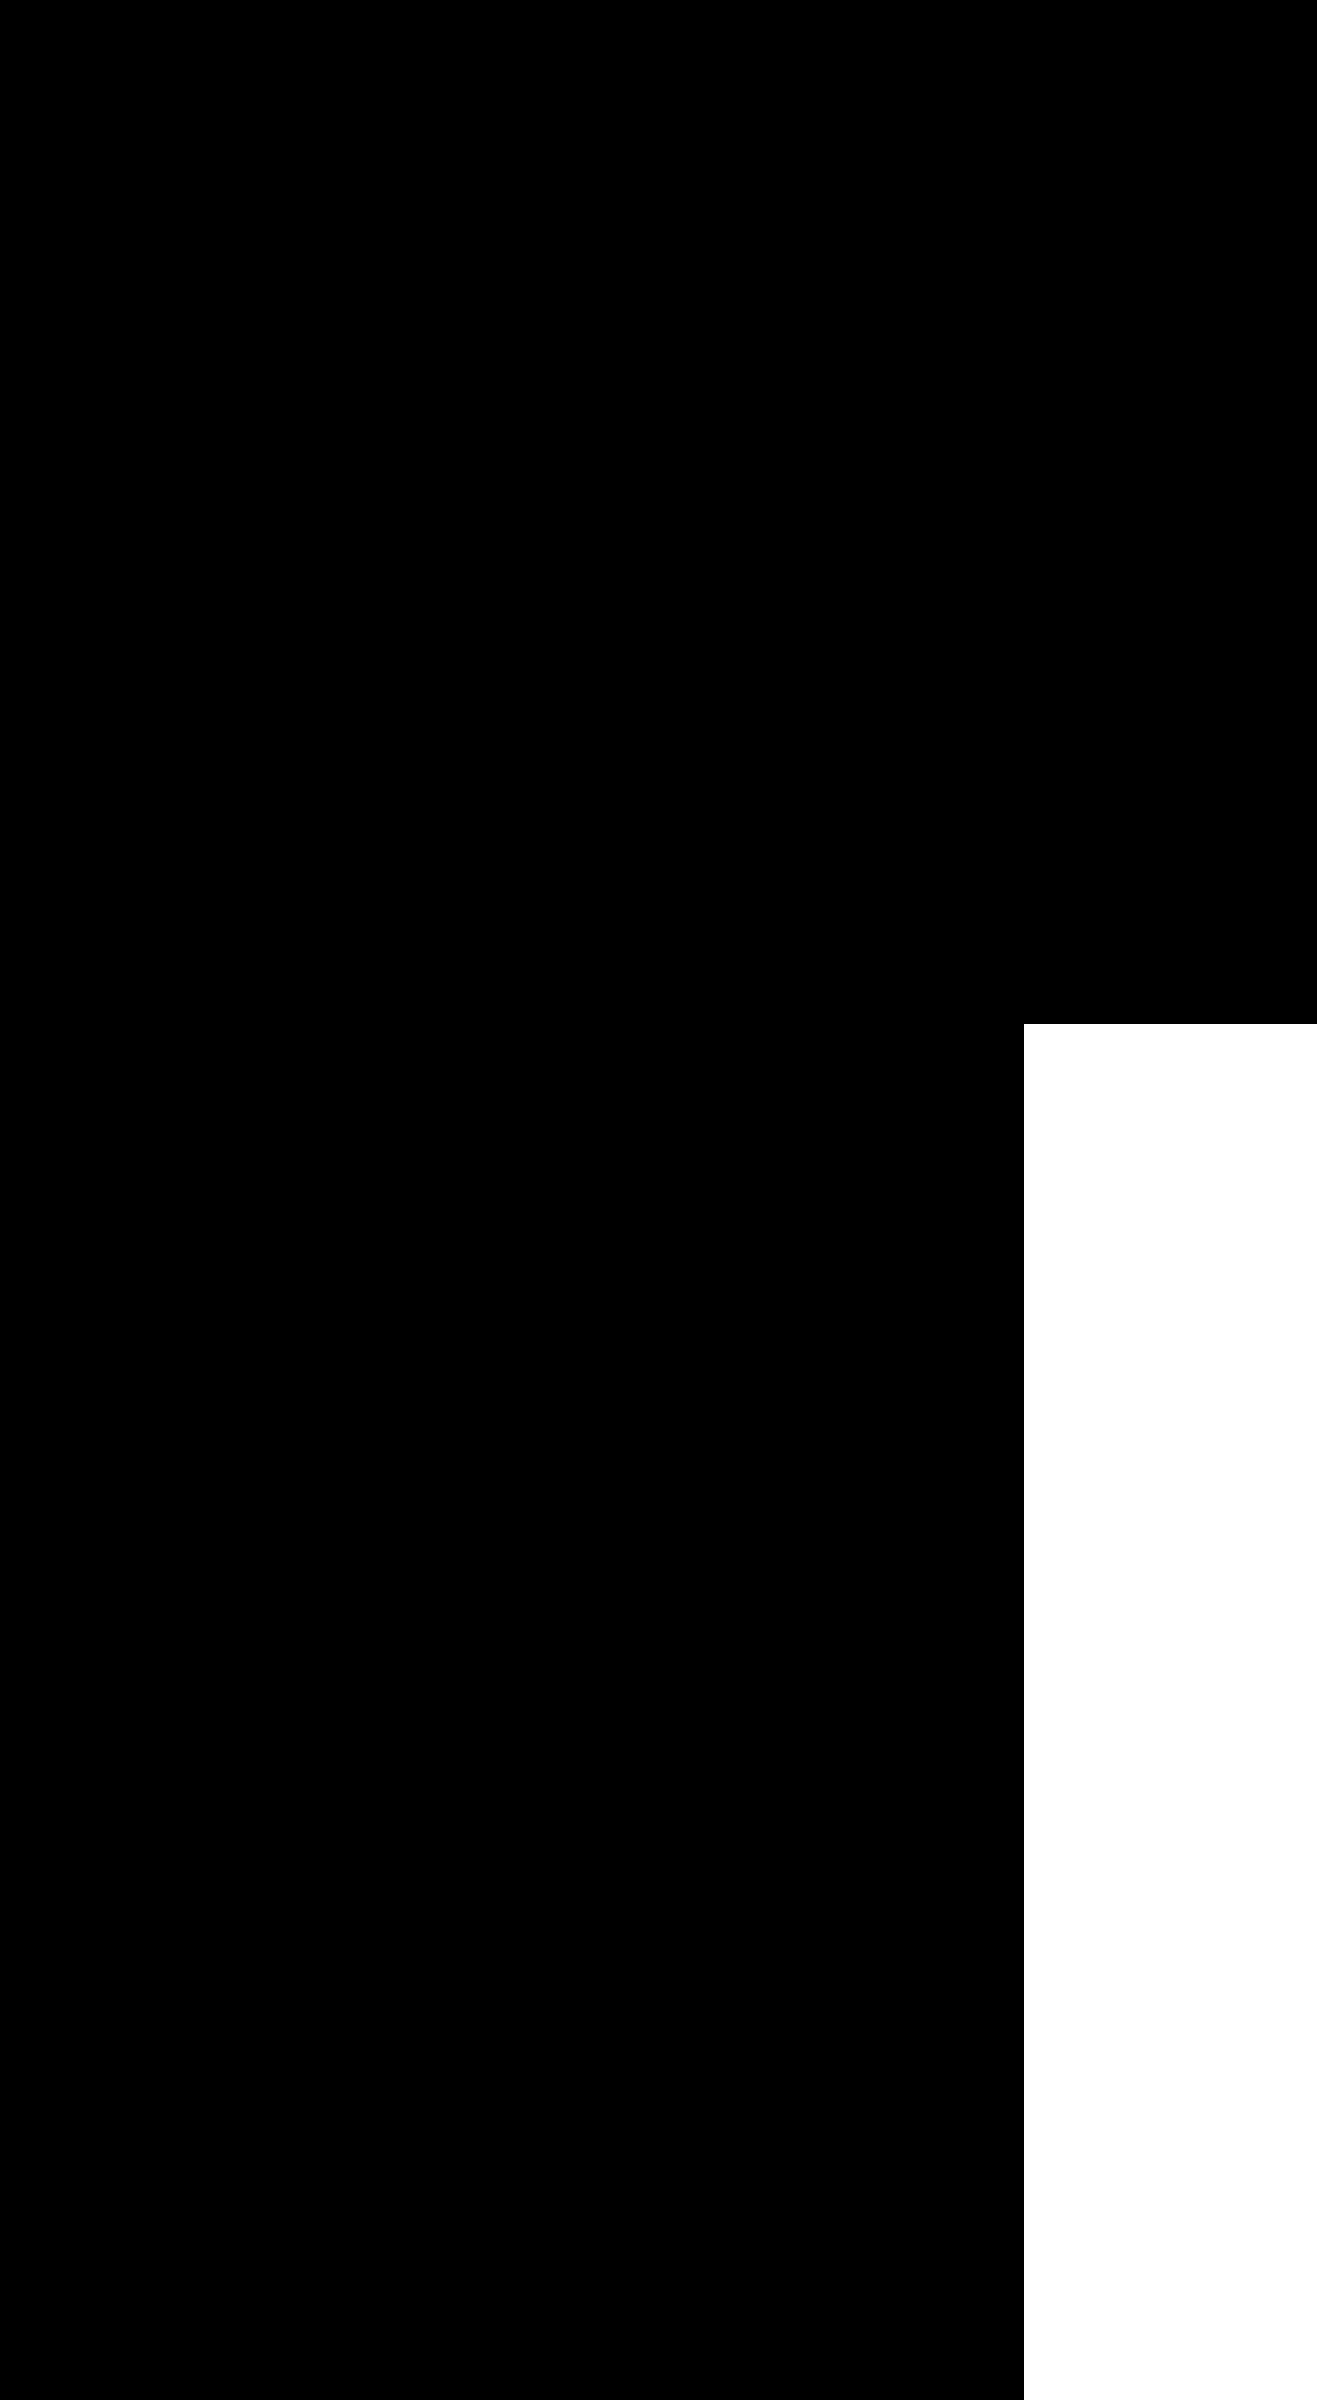 sistrum drawing vector clipart image